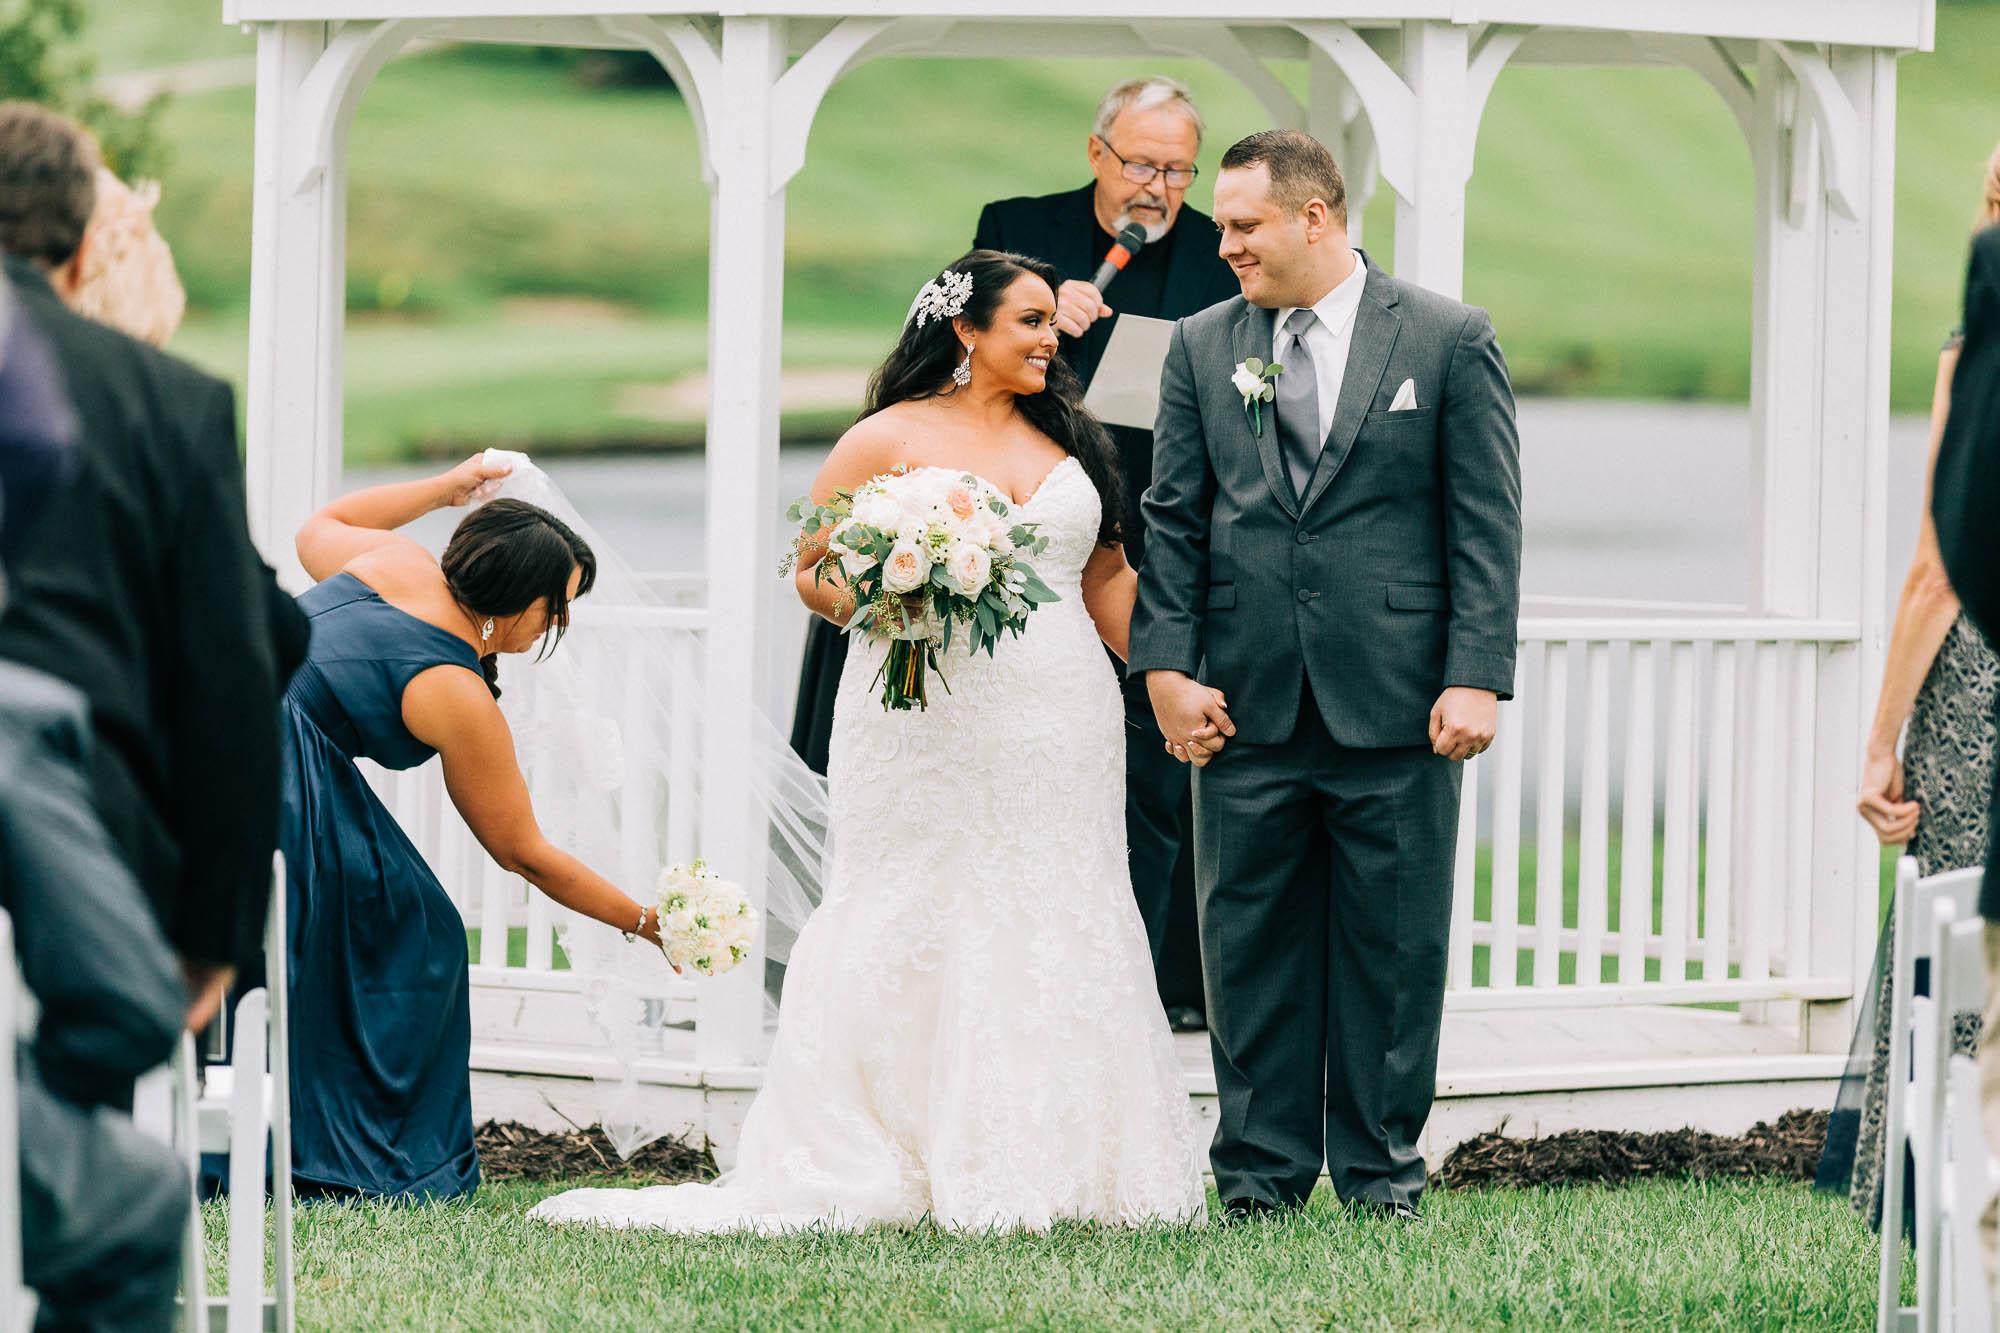 stonhedge-country-club-wedding-8453.jpg